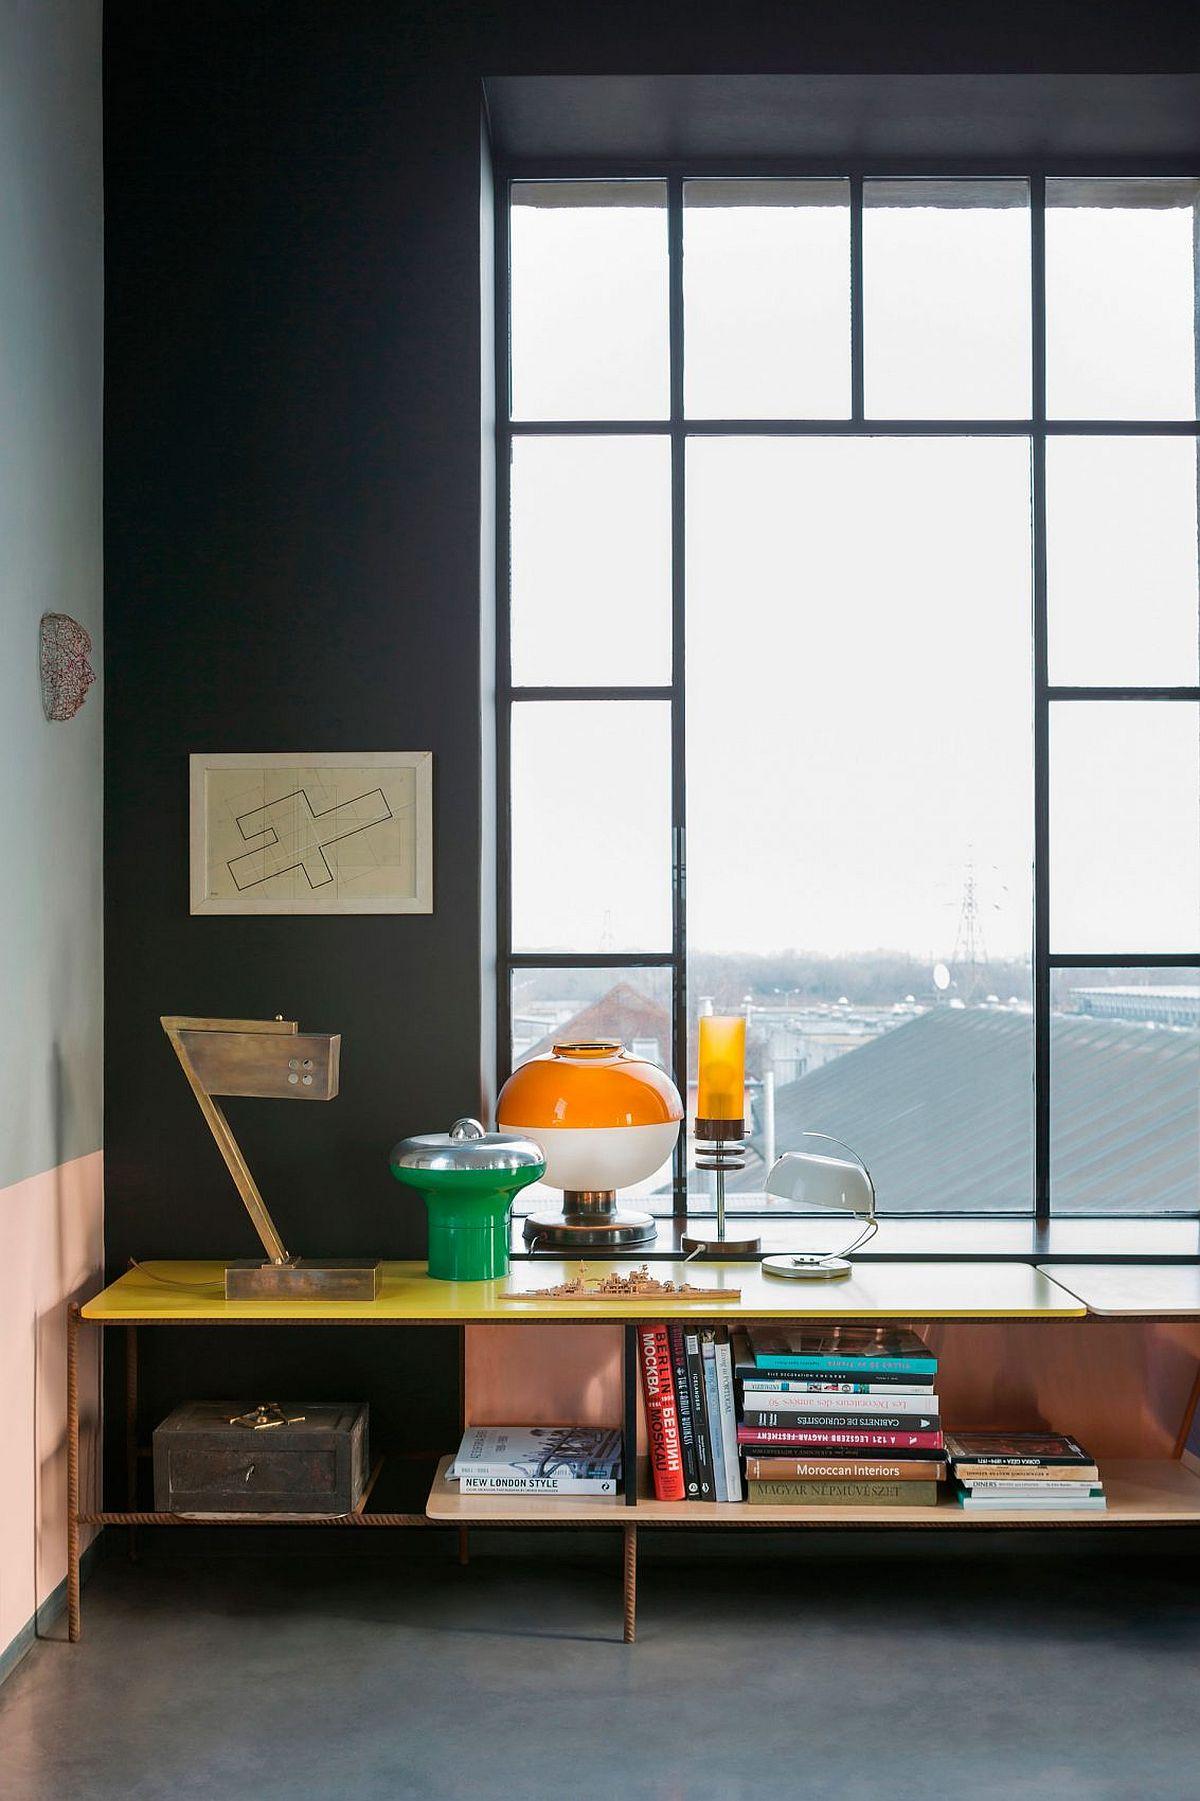 Original beams of the house turned into smart bookshelves